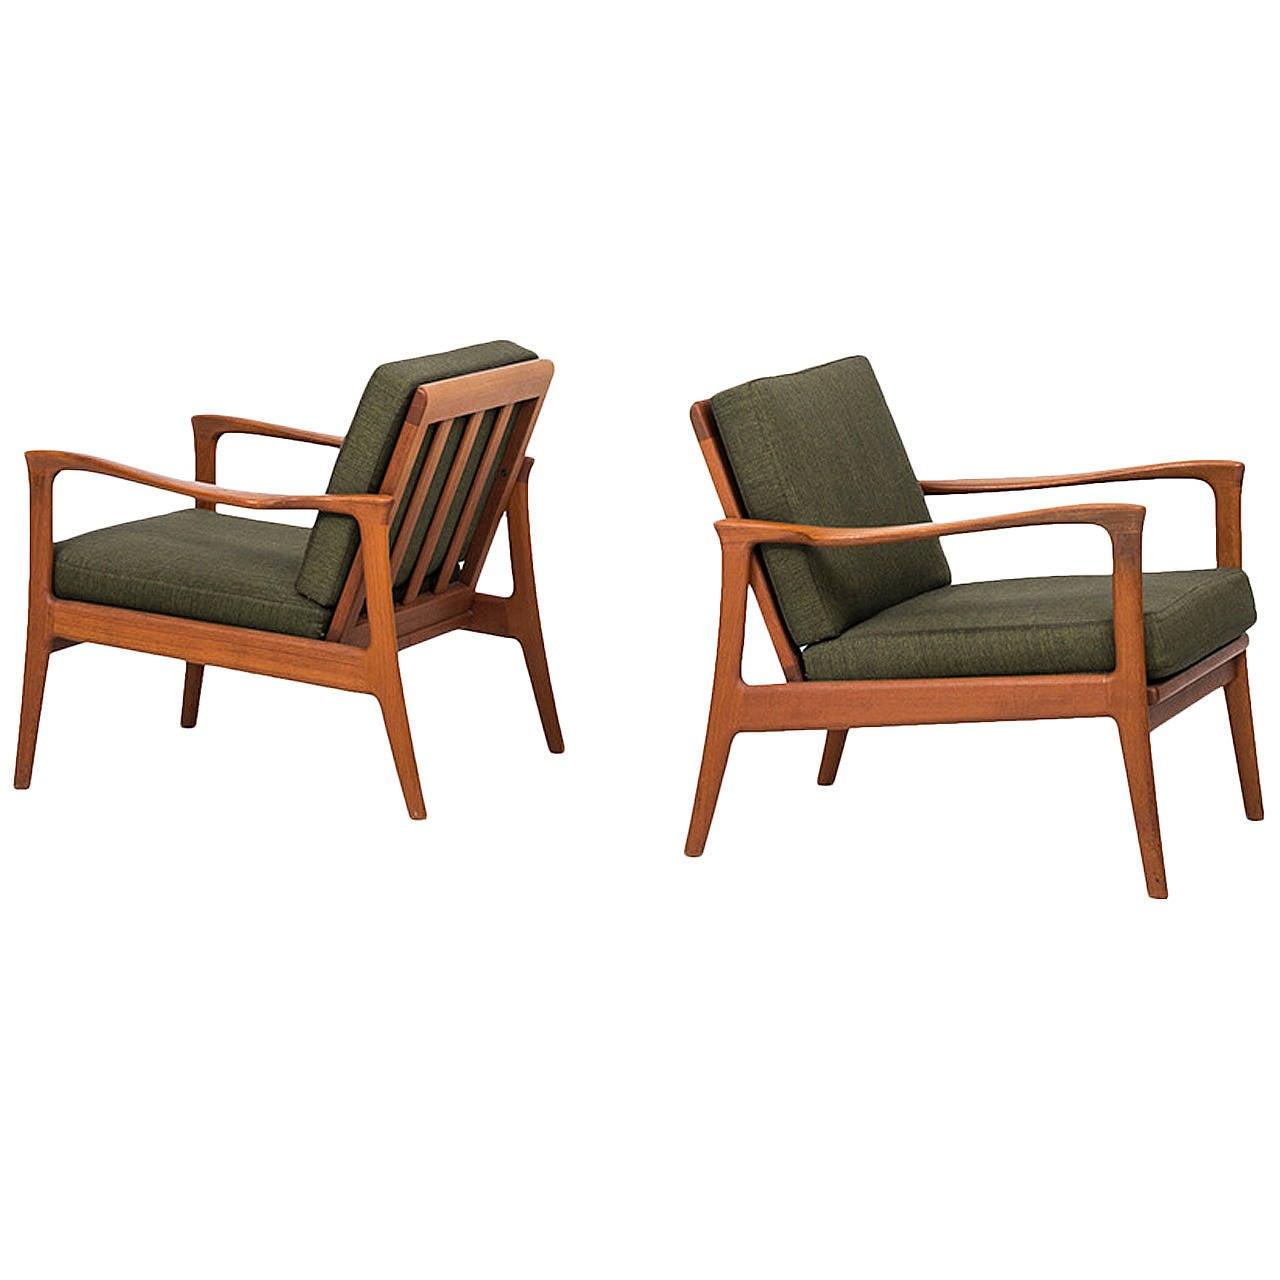 carl erik johansson b ja easy chairs by bejra m bel. Black Bedroom Furniture Sets. Home Design Ideas